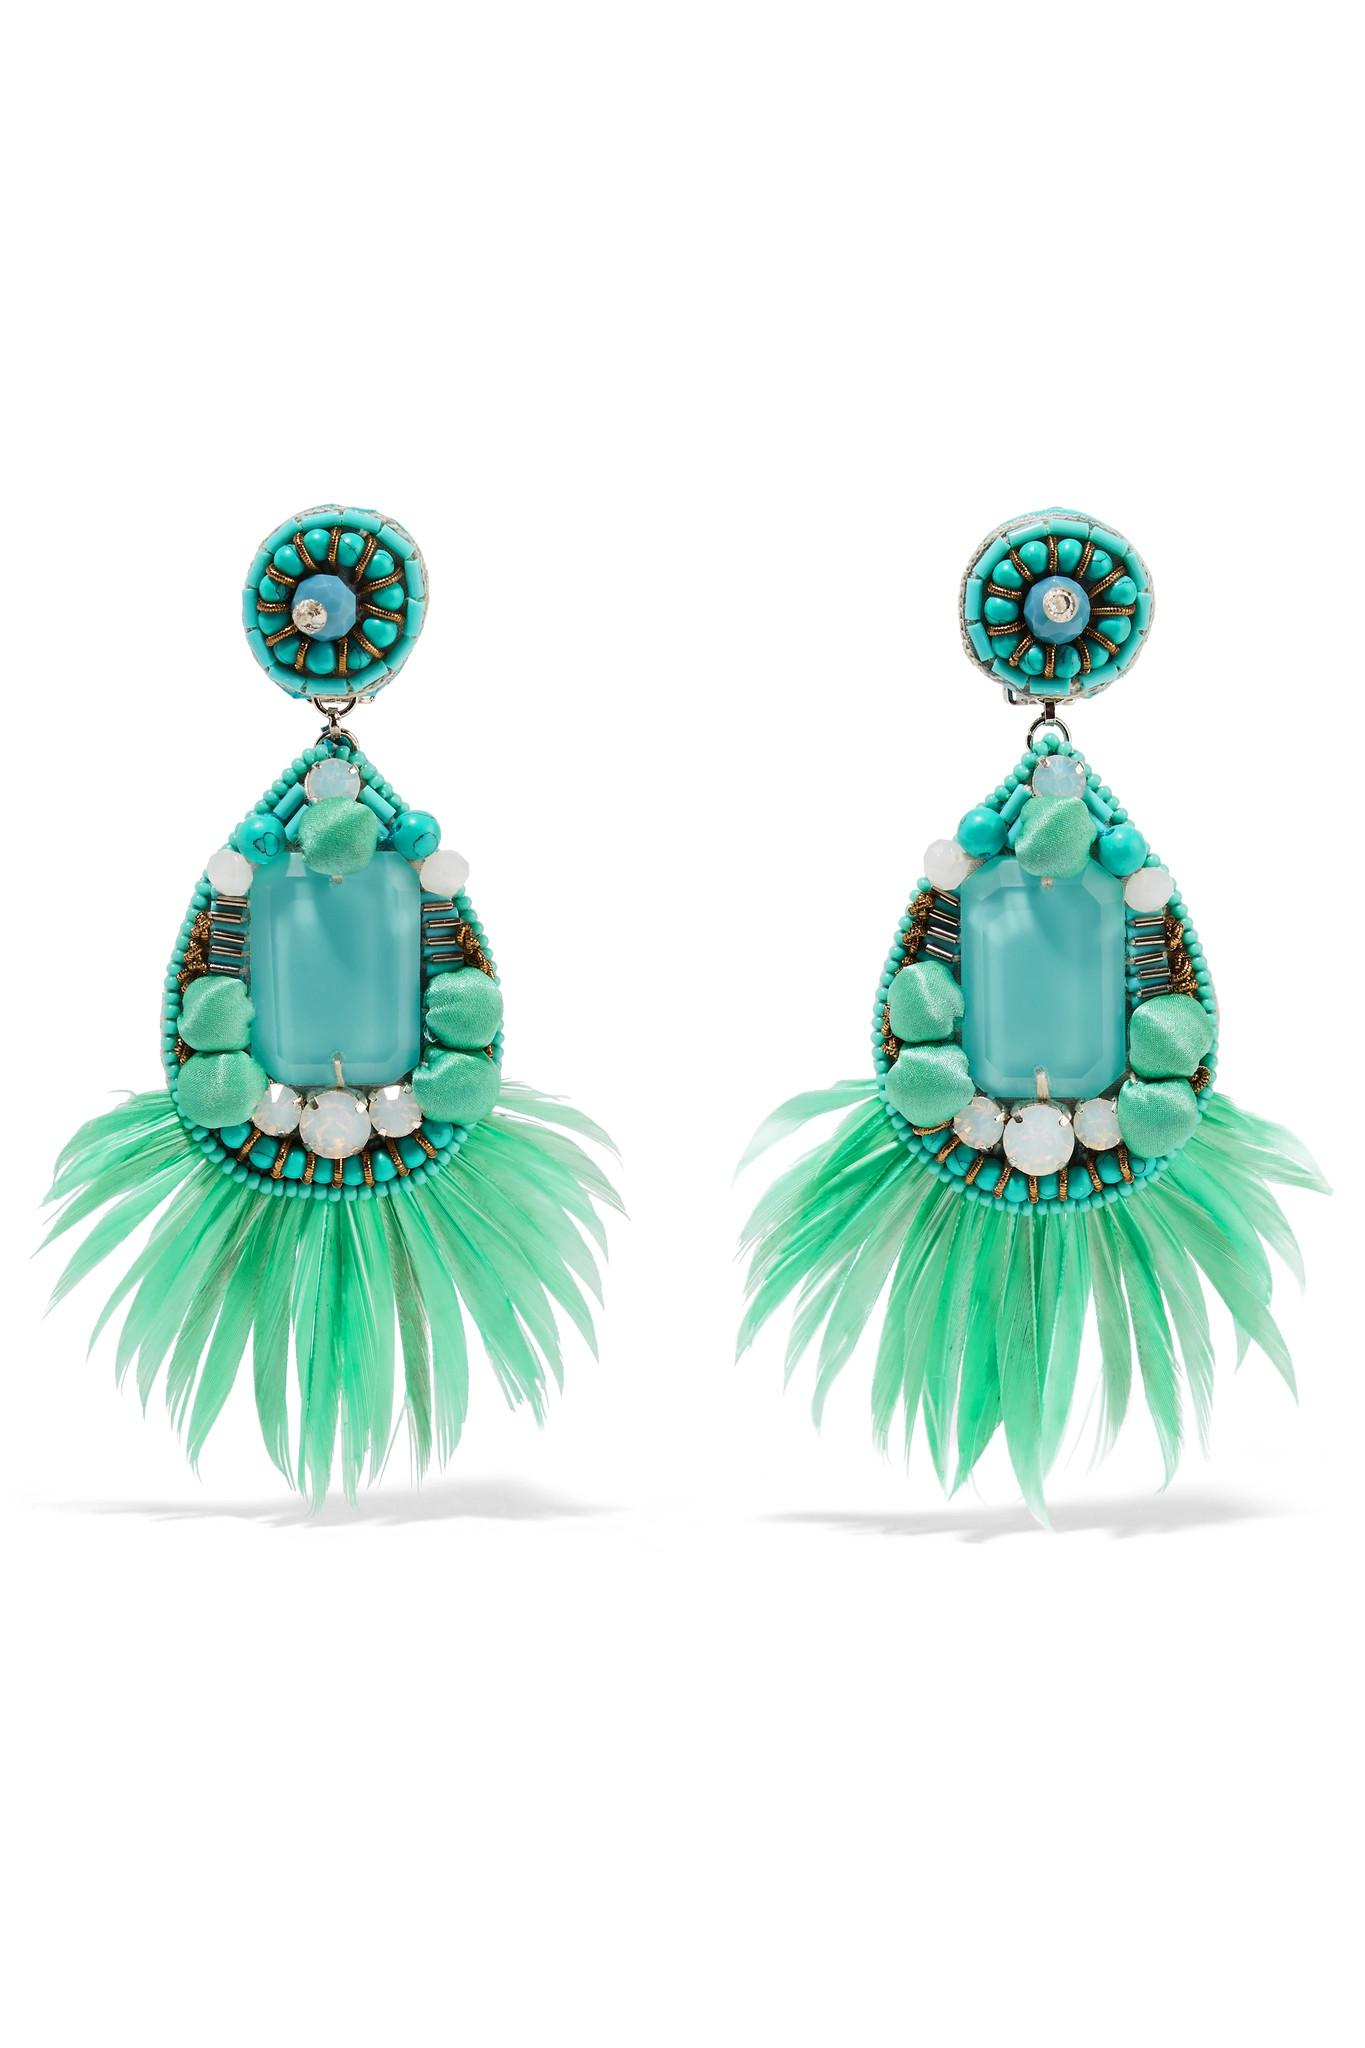 Ranjana Khan Jae Feather And Crystal Clip Earrings - Mint lnr95uX1bP